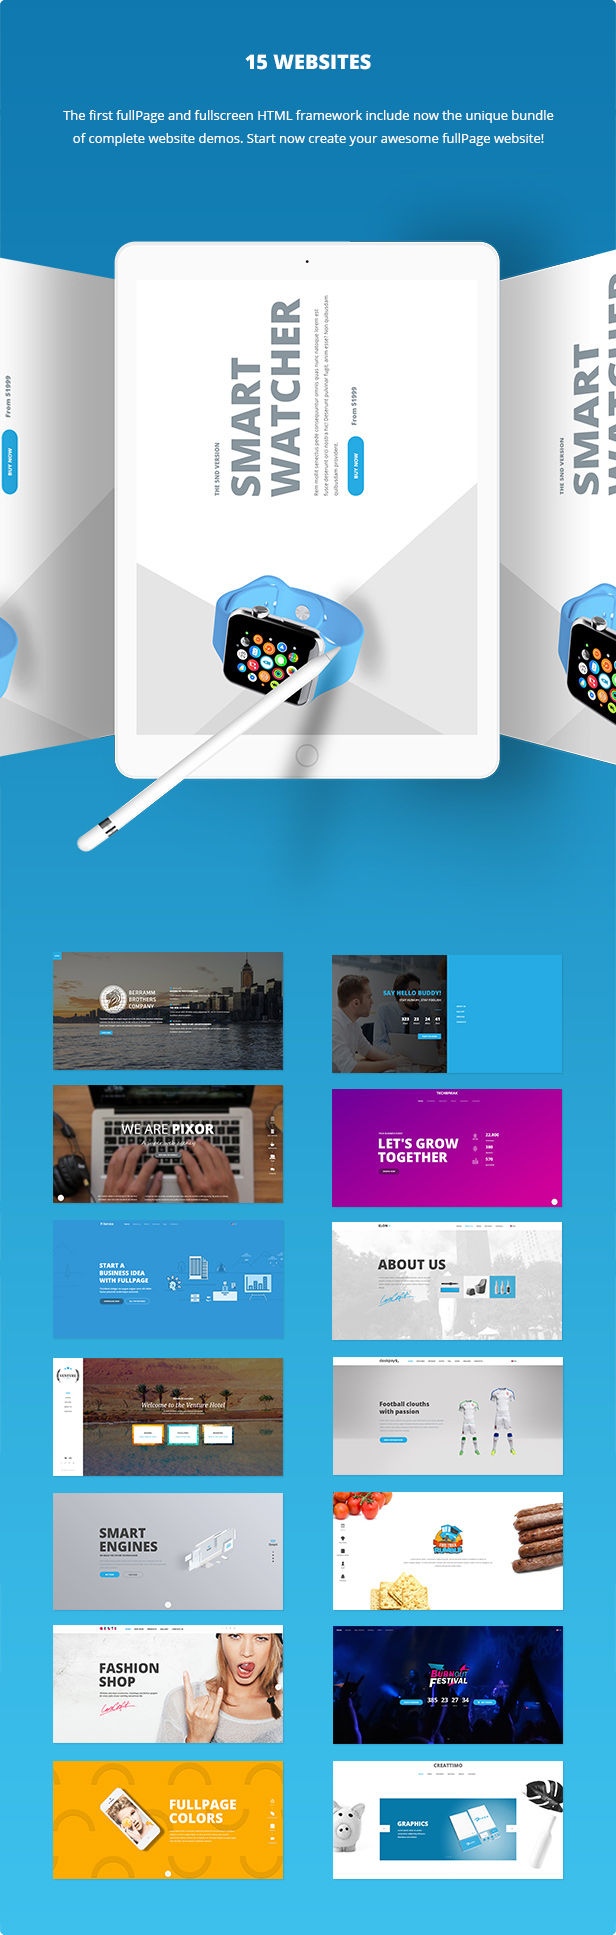 FullPage -  Fullscreen Multi Concept HTML5 Template - 2